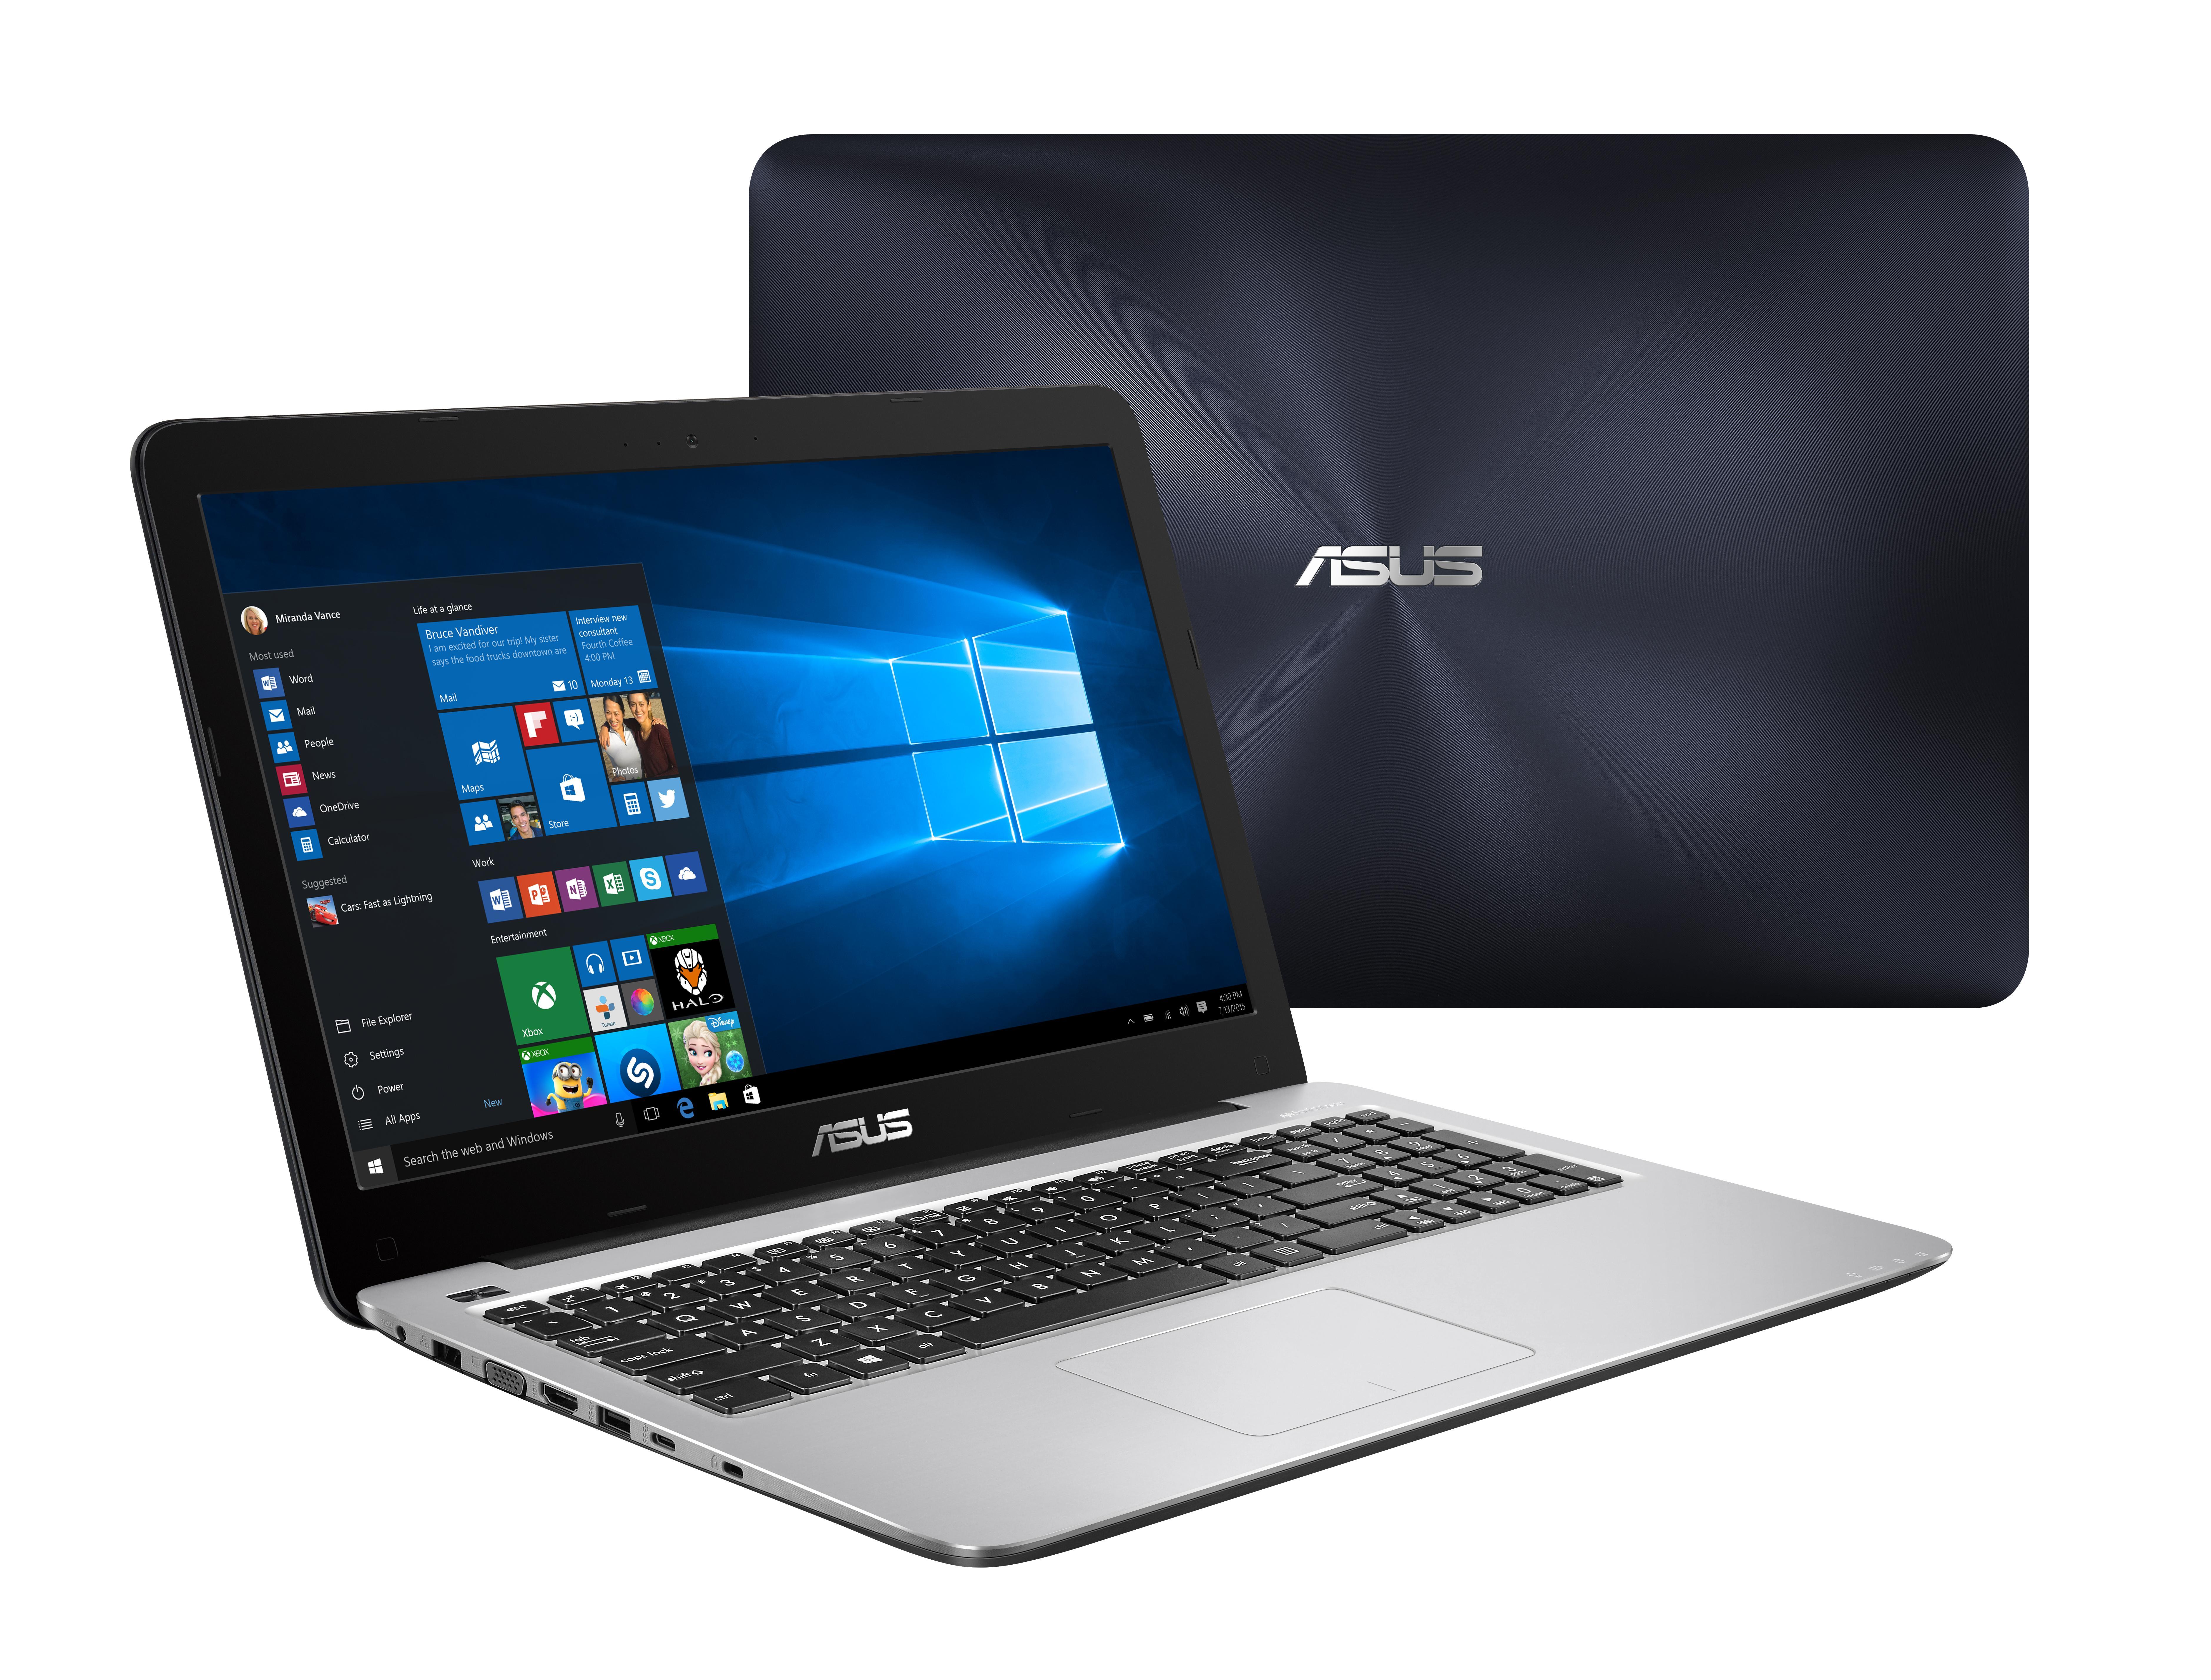 "ASUS VivoBook X556UB-DM262T 2.3GHz i3-6100U 15.6"" Blue,Silver"